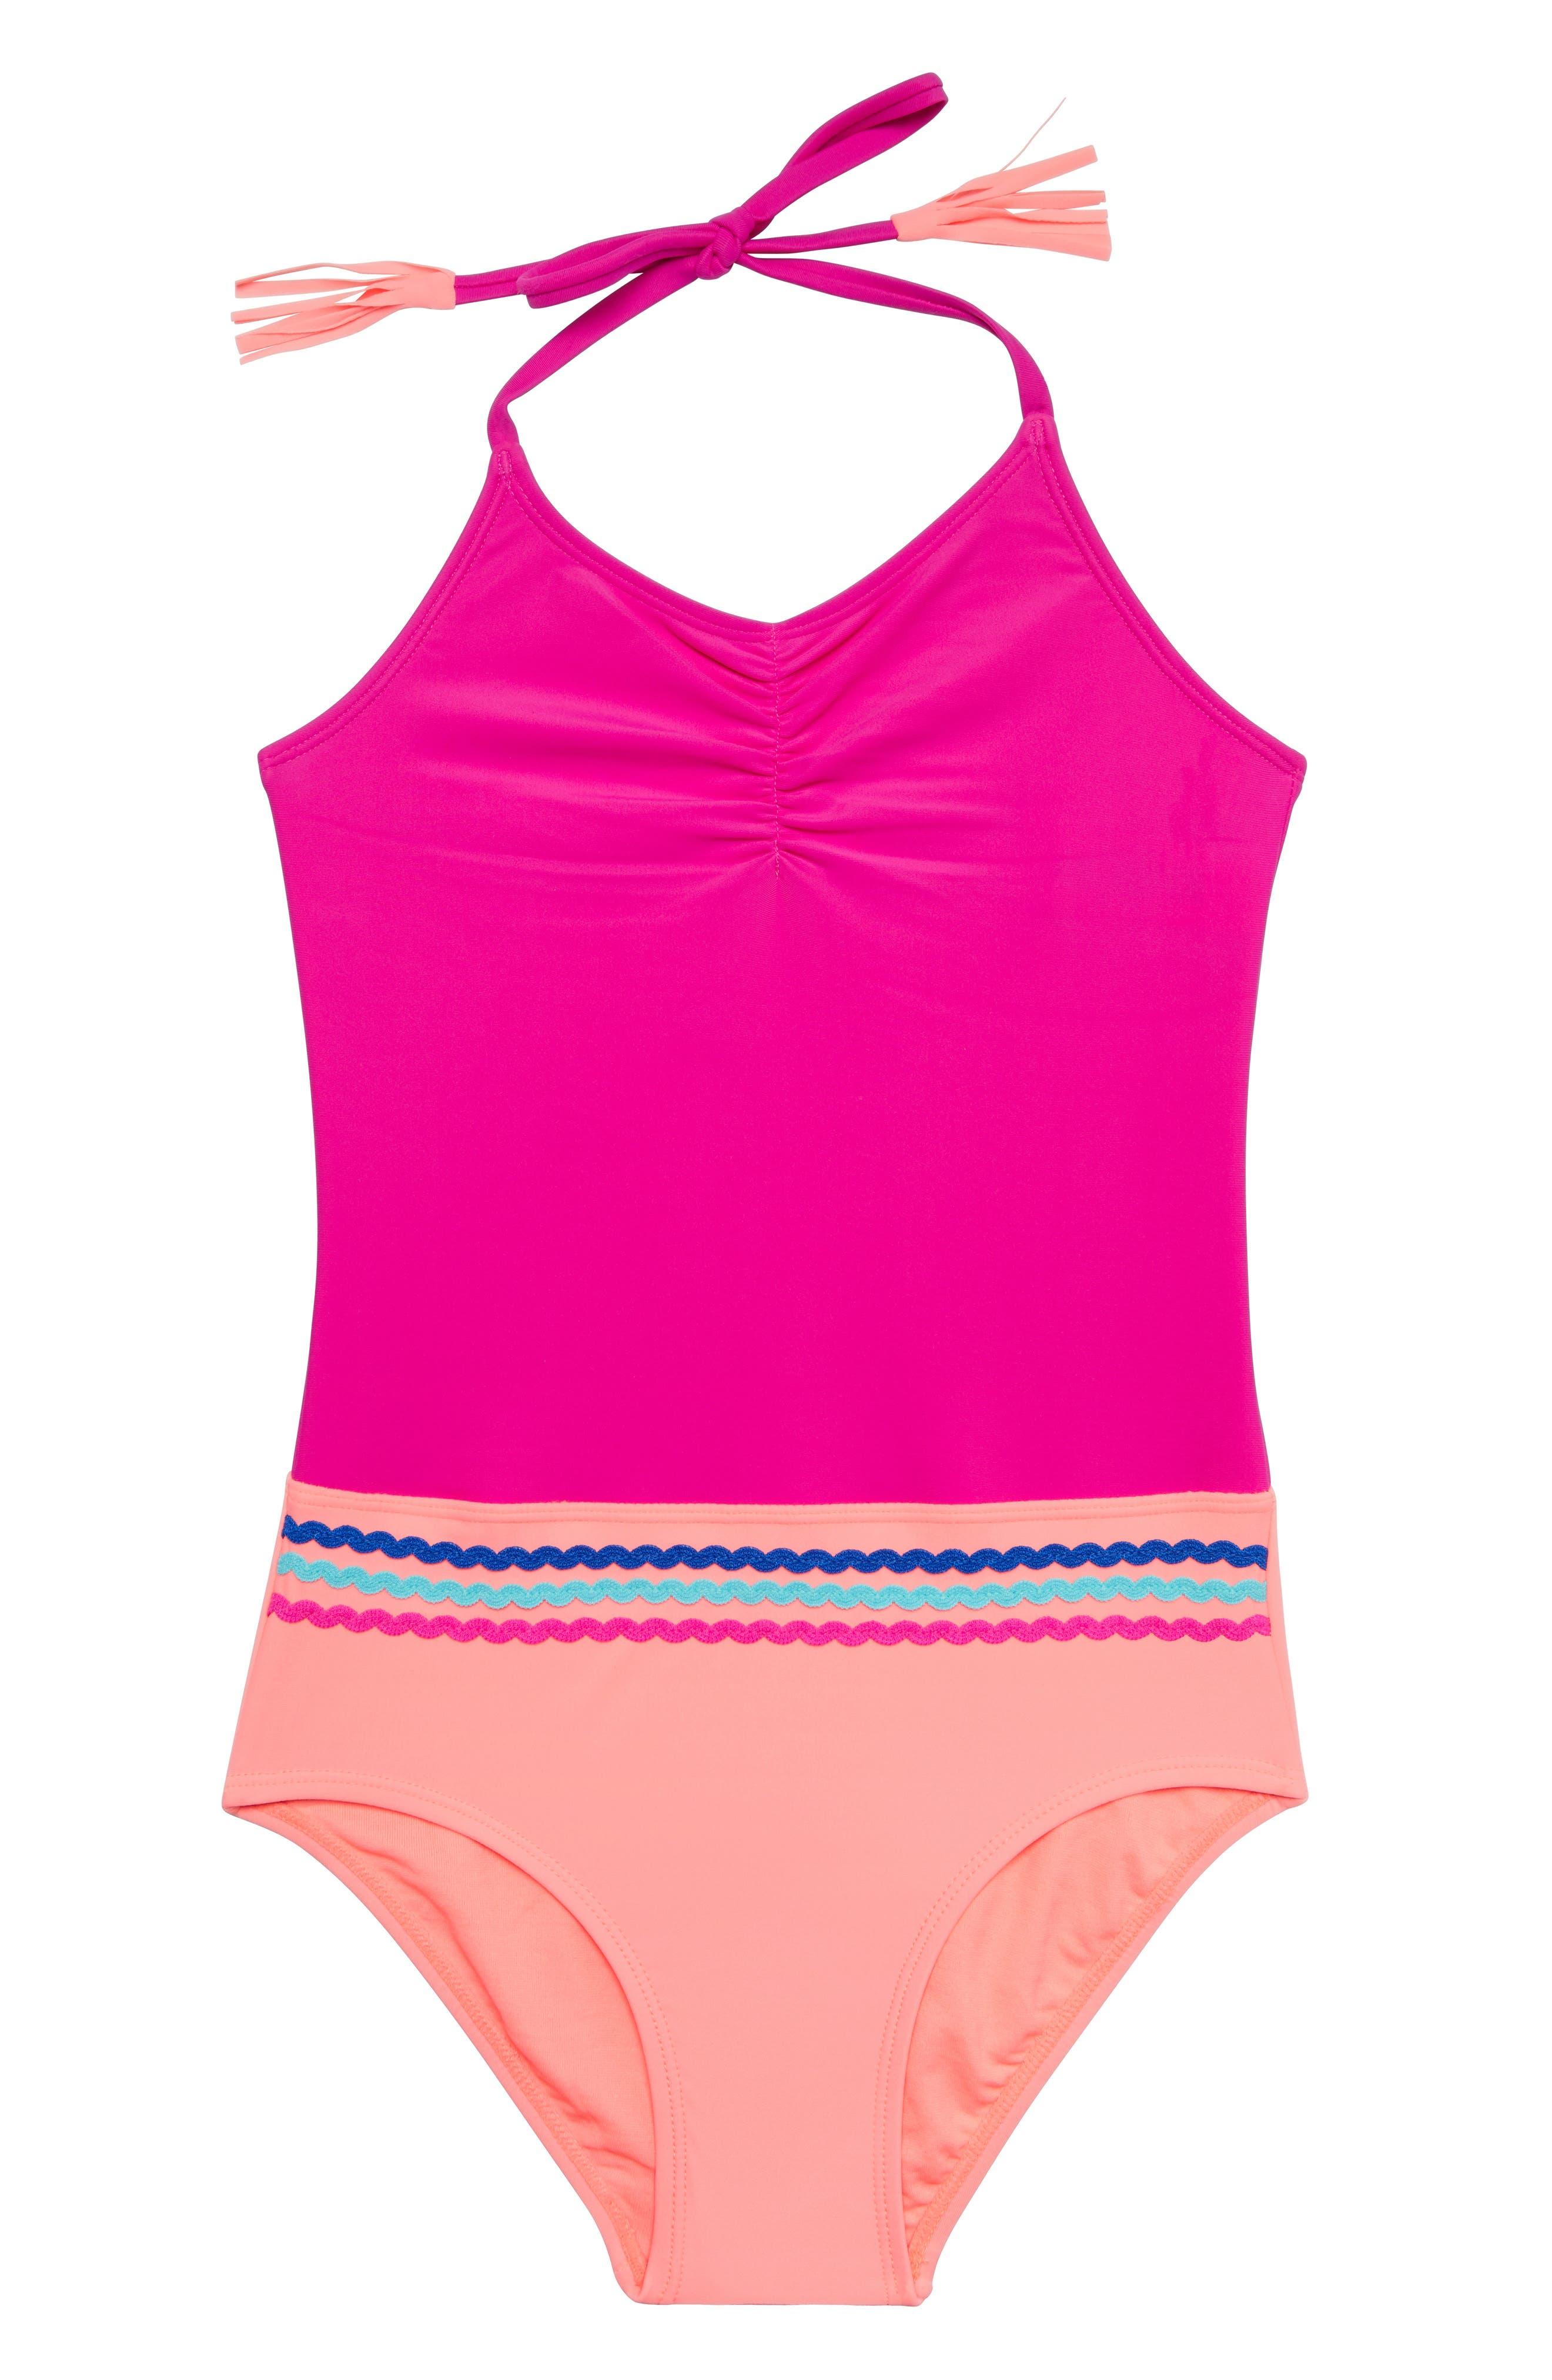 048193465838f Girl's Gossip Girl Malibu Stripe One-Piece Swimsuit